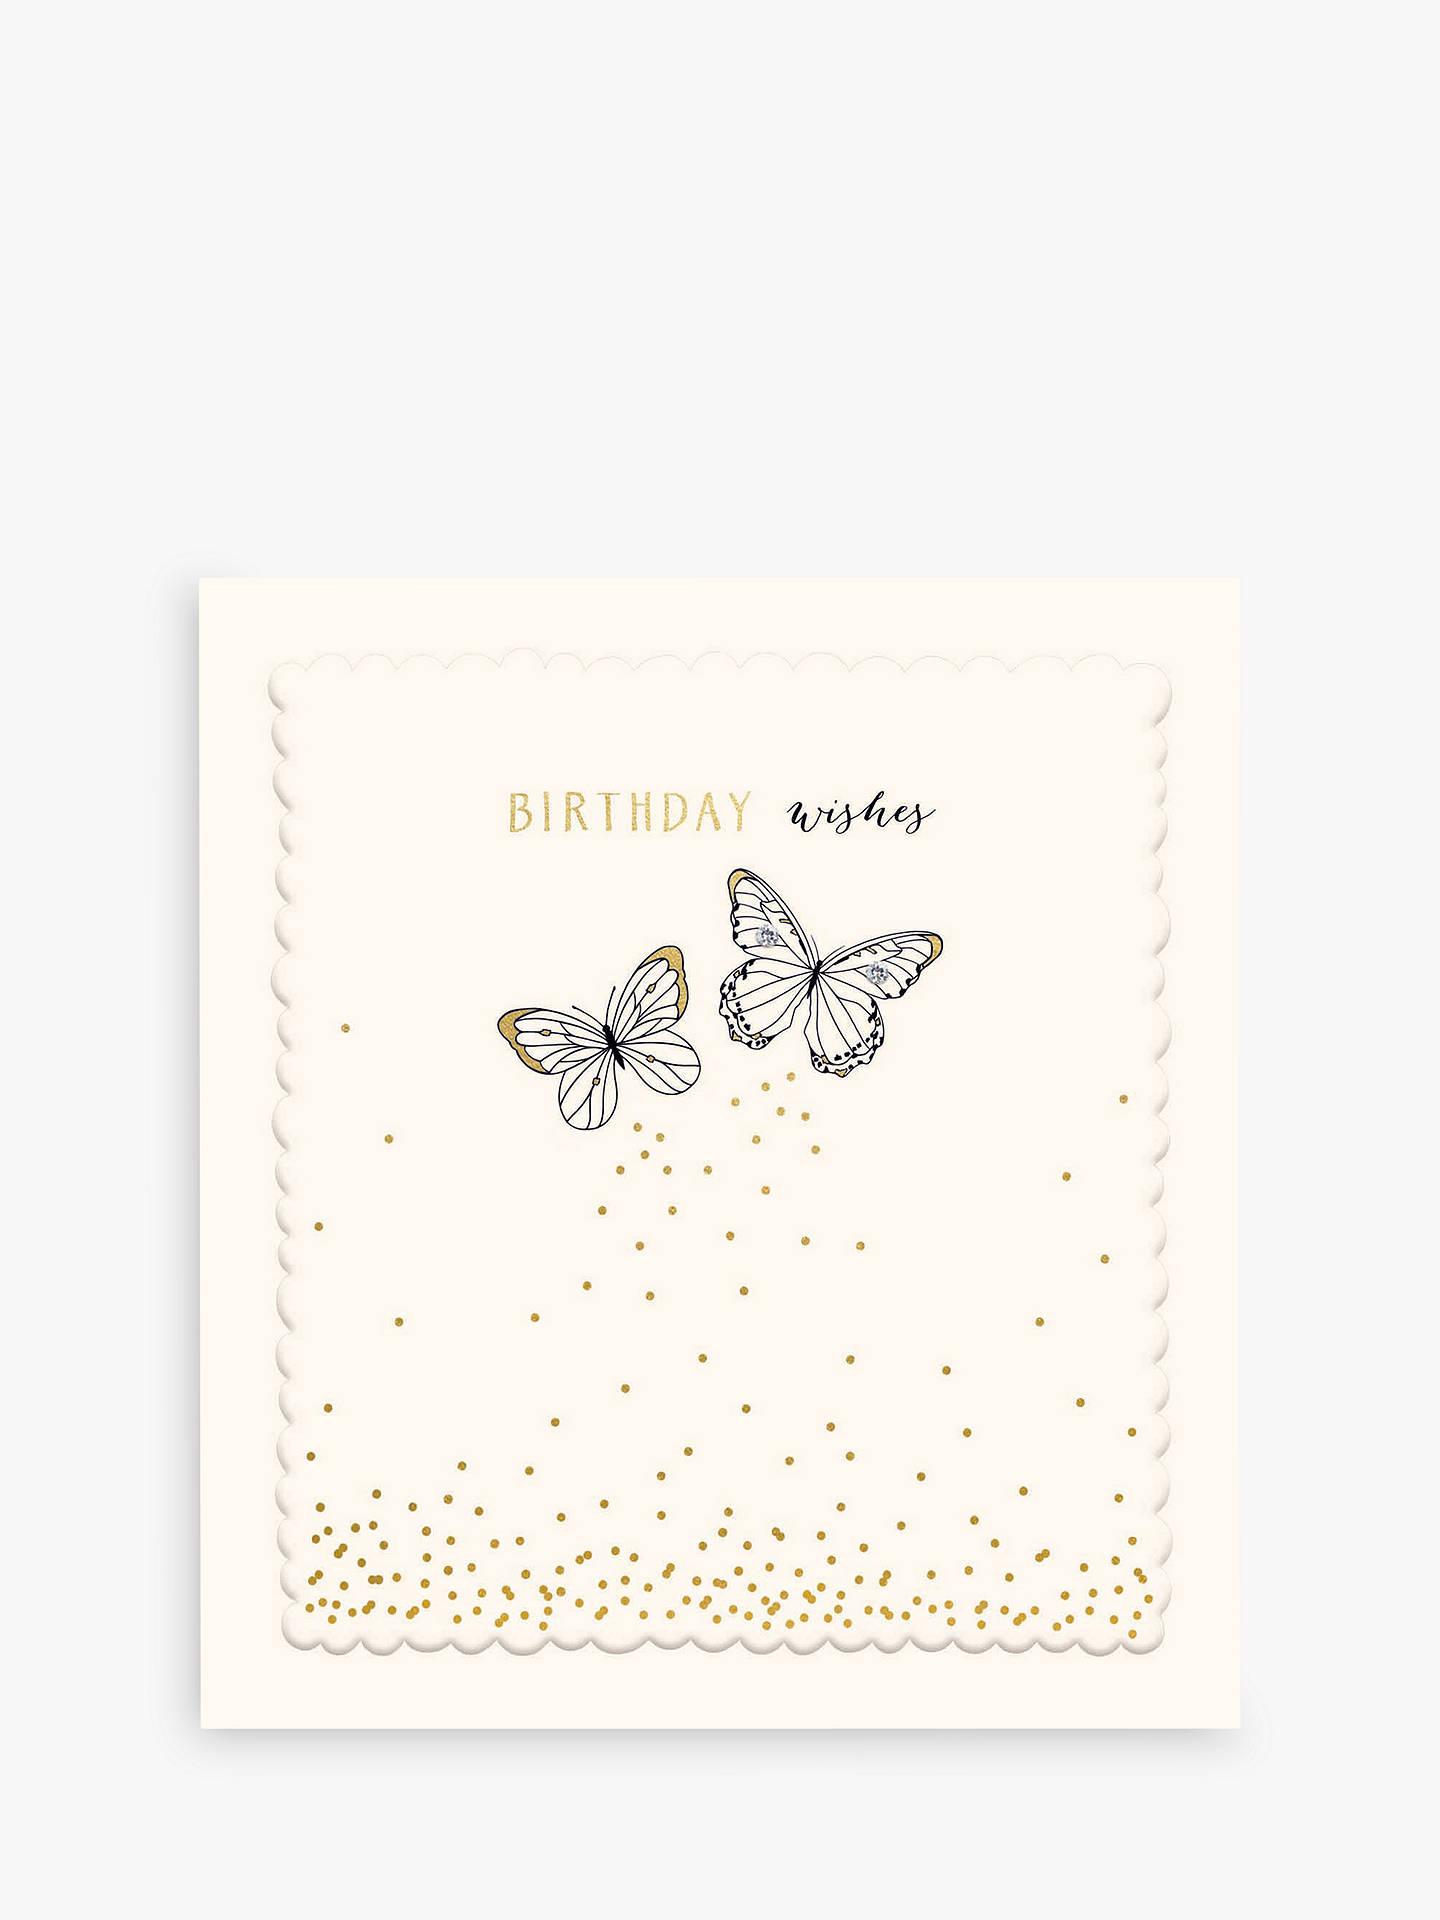 BUTTERFLY Acrylic Mirror Bathroom Birthday Anniversary Gift PERSONALISED 4 FREE